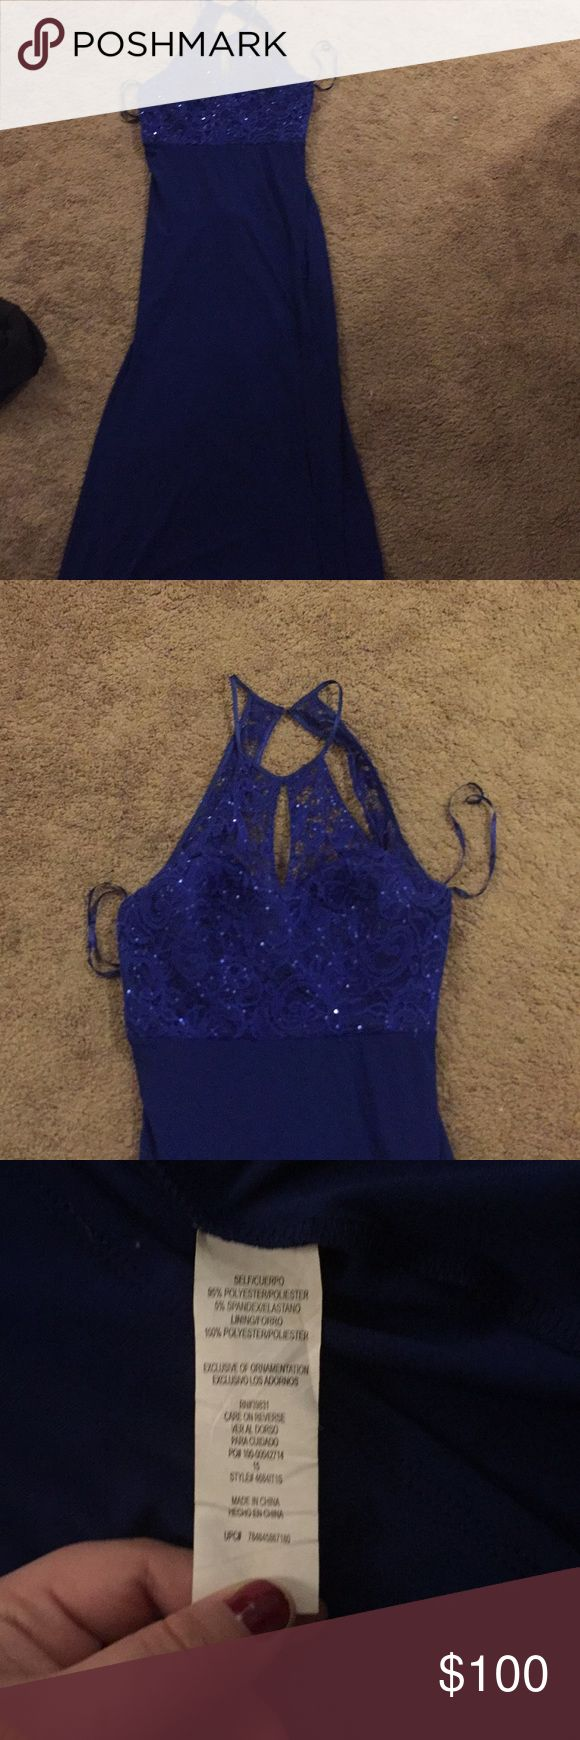 Dillard's homecoming dress Worn once for homecoming dillards Dresses